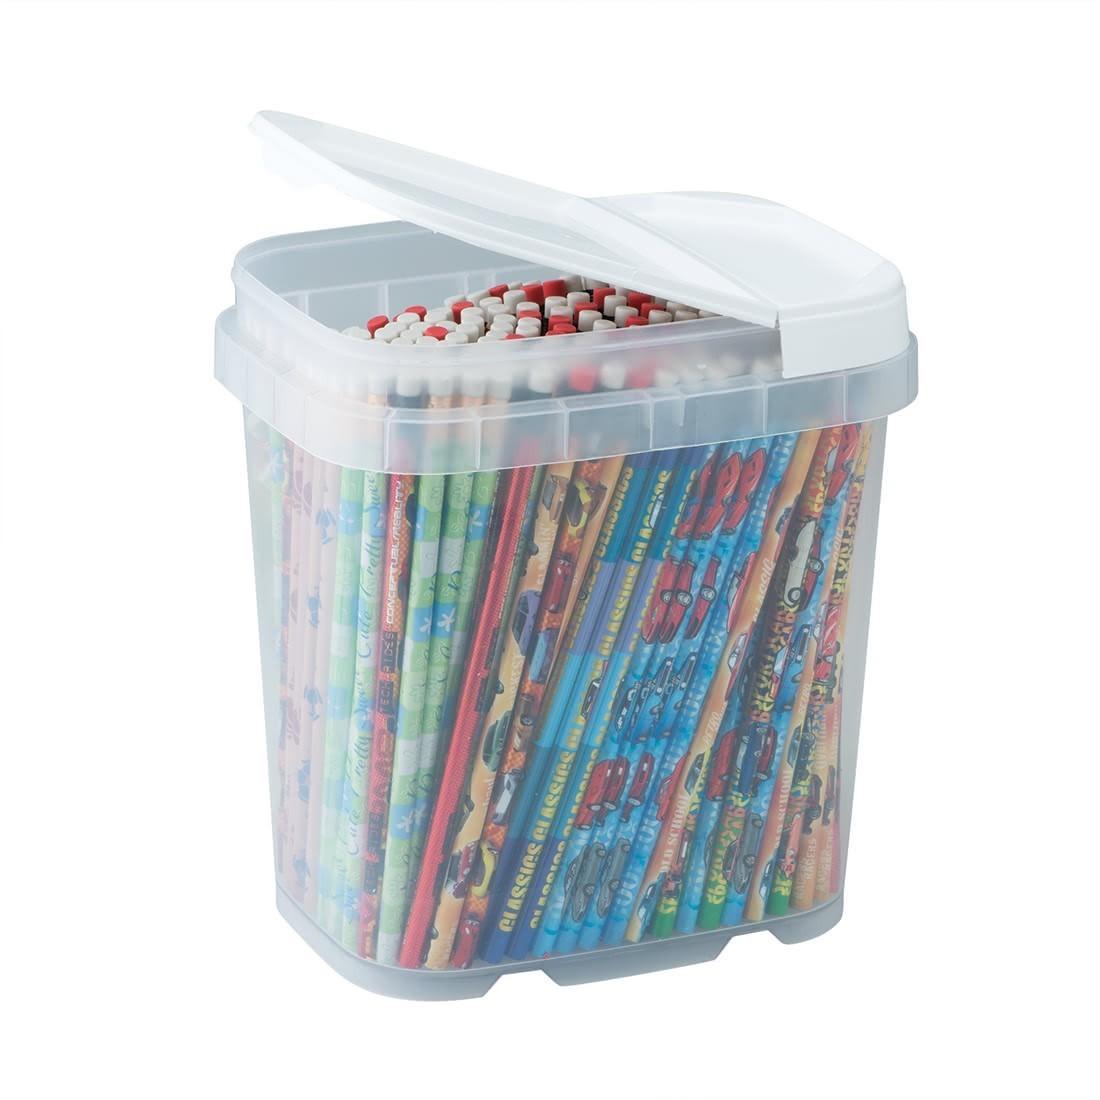 SmileMakers Pencil Sampler [image]